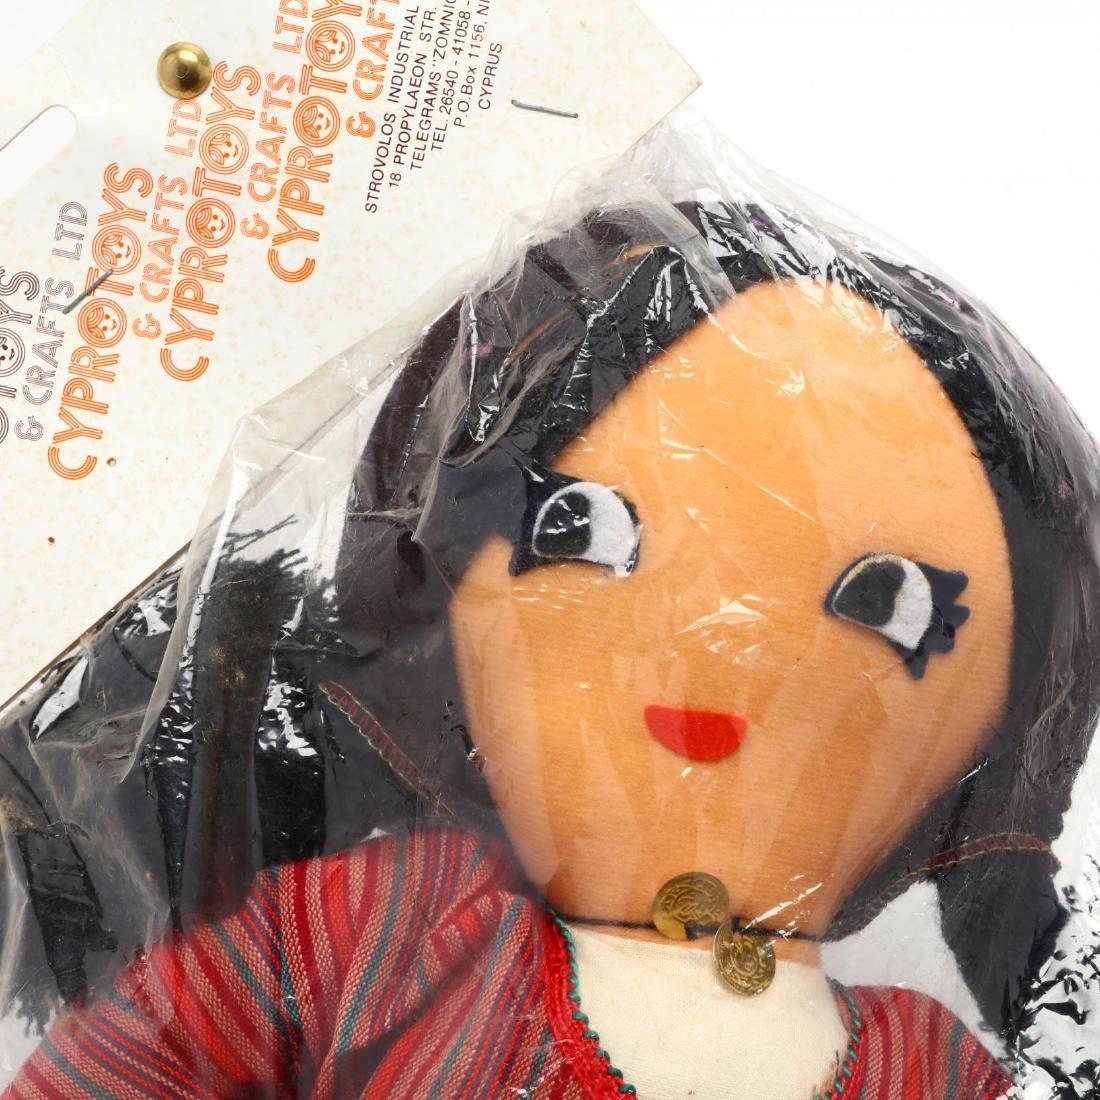 Pair of Handmade Dolls, Cyprus Crafts LTD. - 5